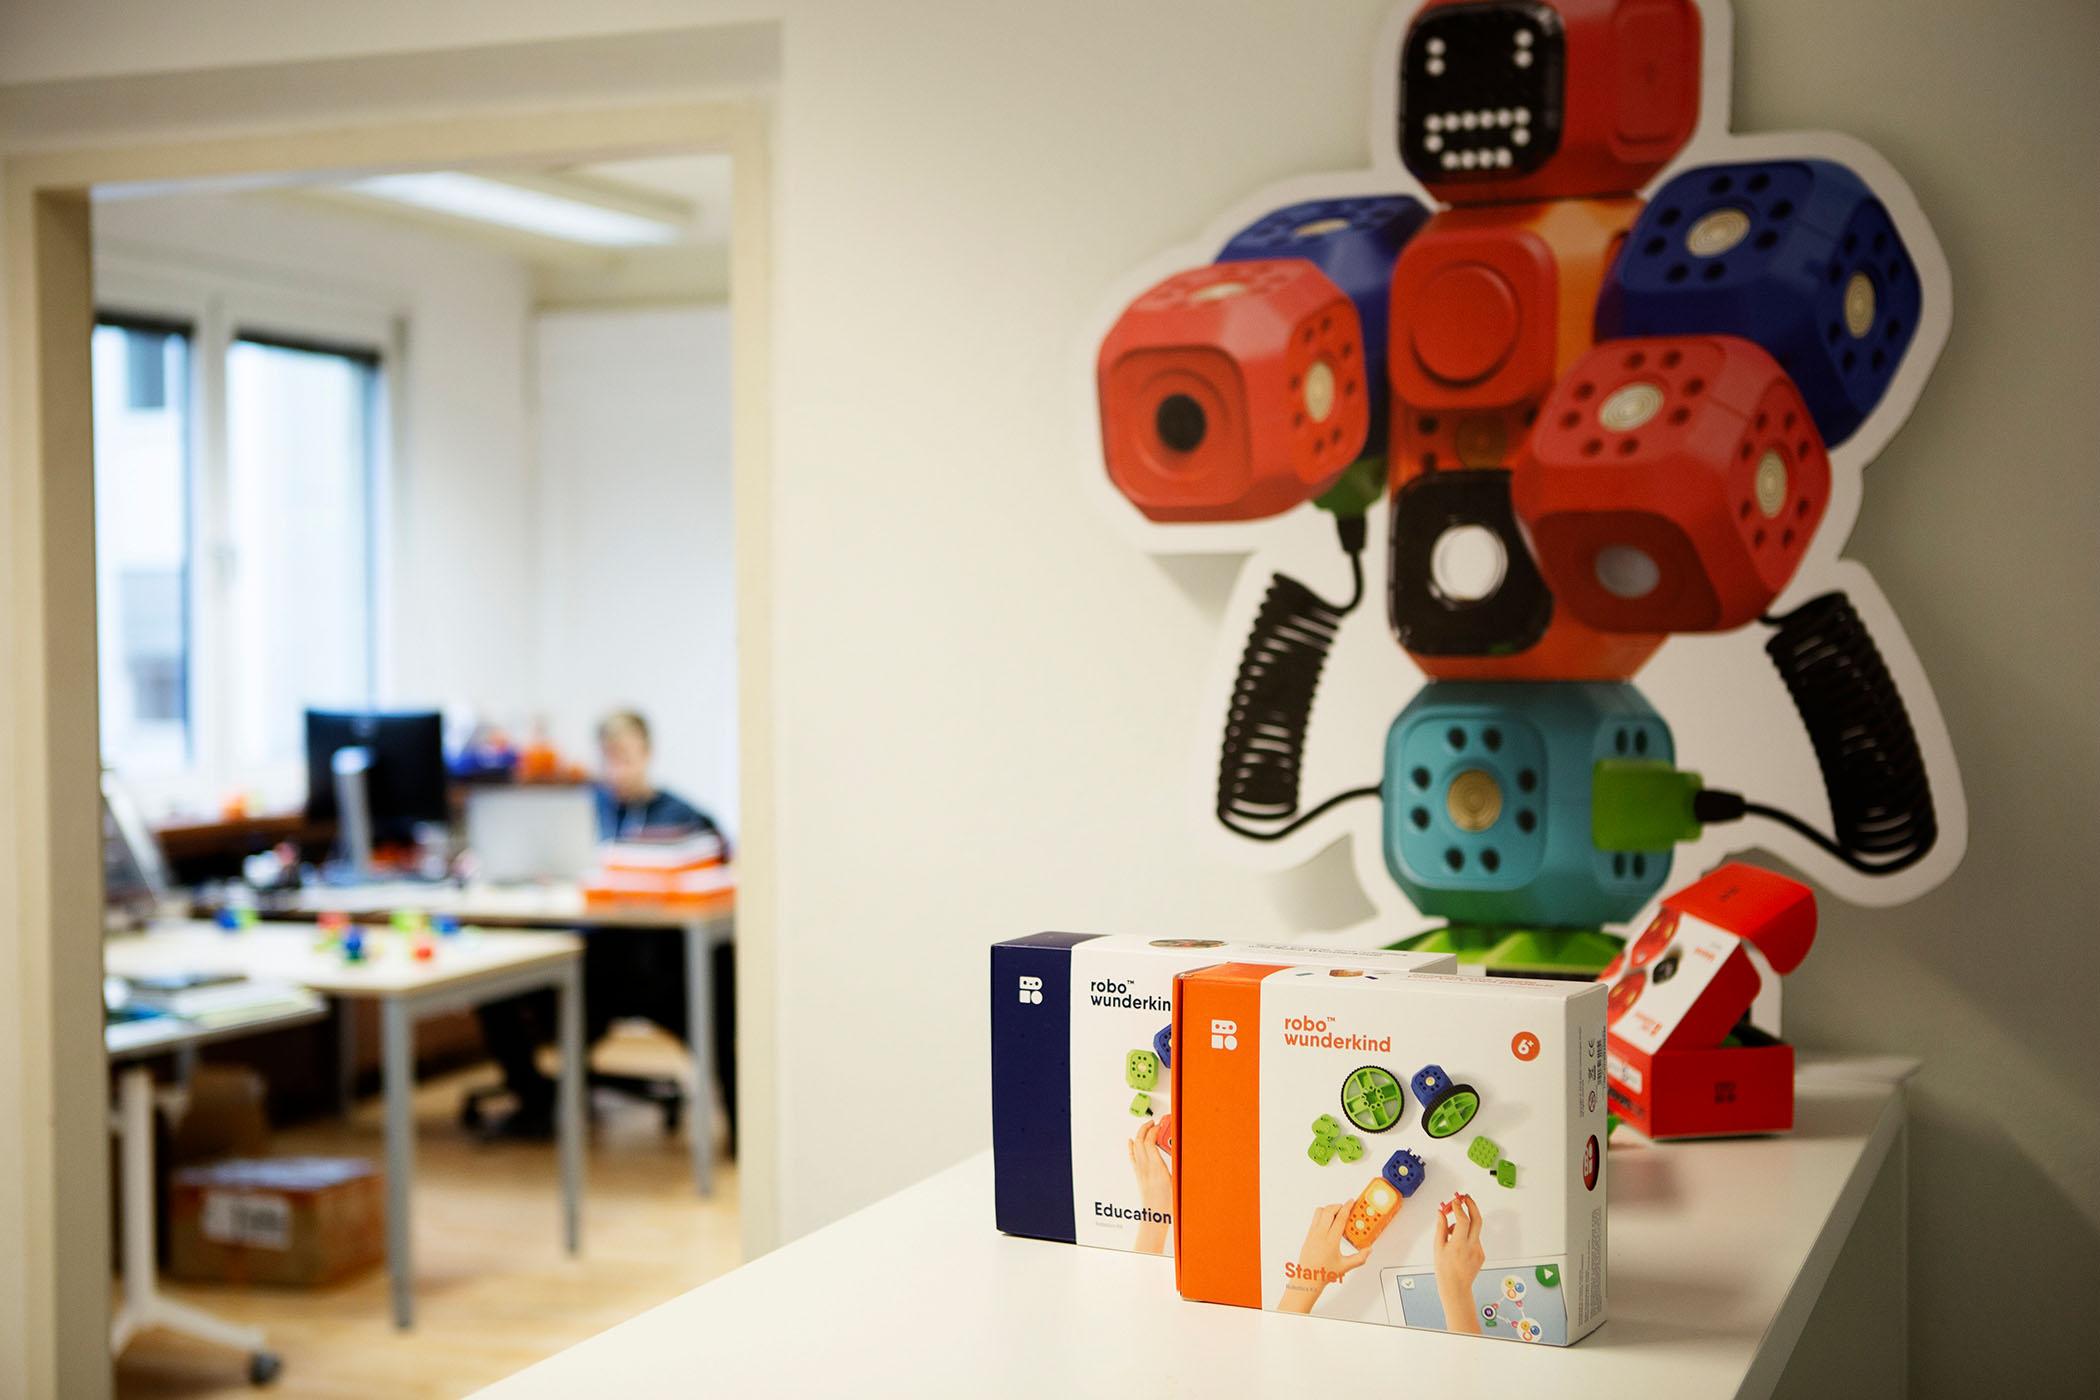 11-robotics-lernen-kinder